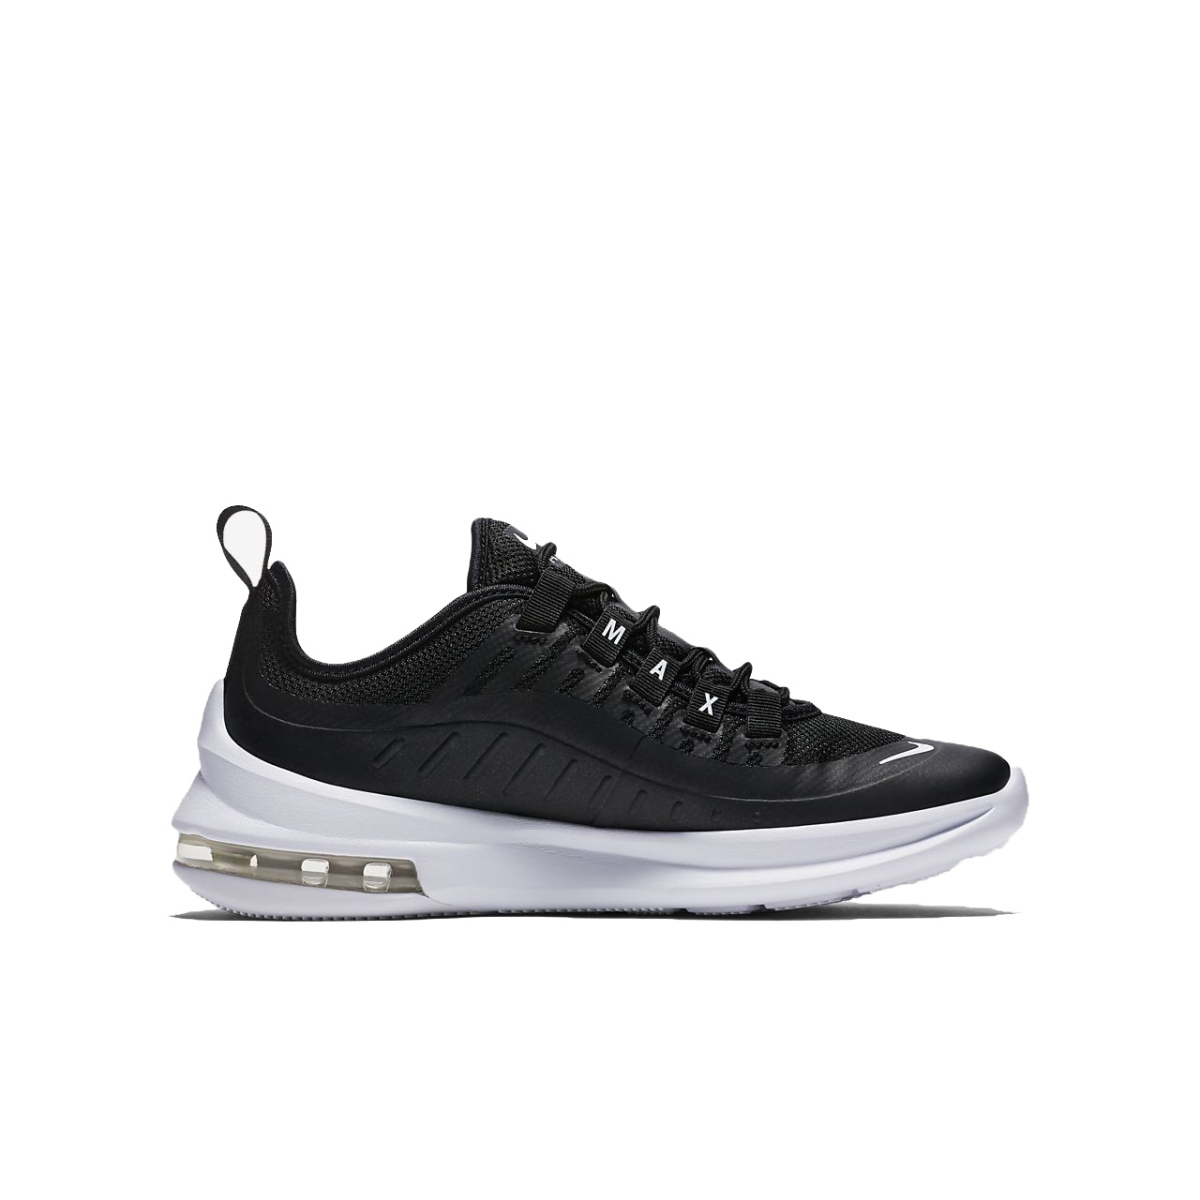 de2b3523cef Nike Air Max Axis (gs) Junior - Schoenen - Casual - Intersport van ...